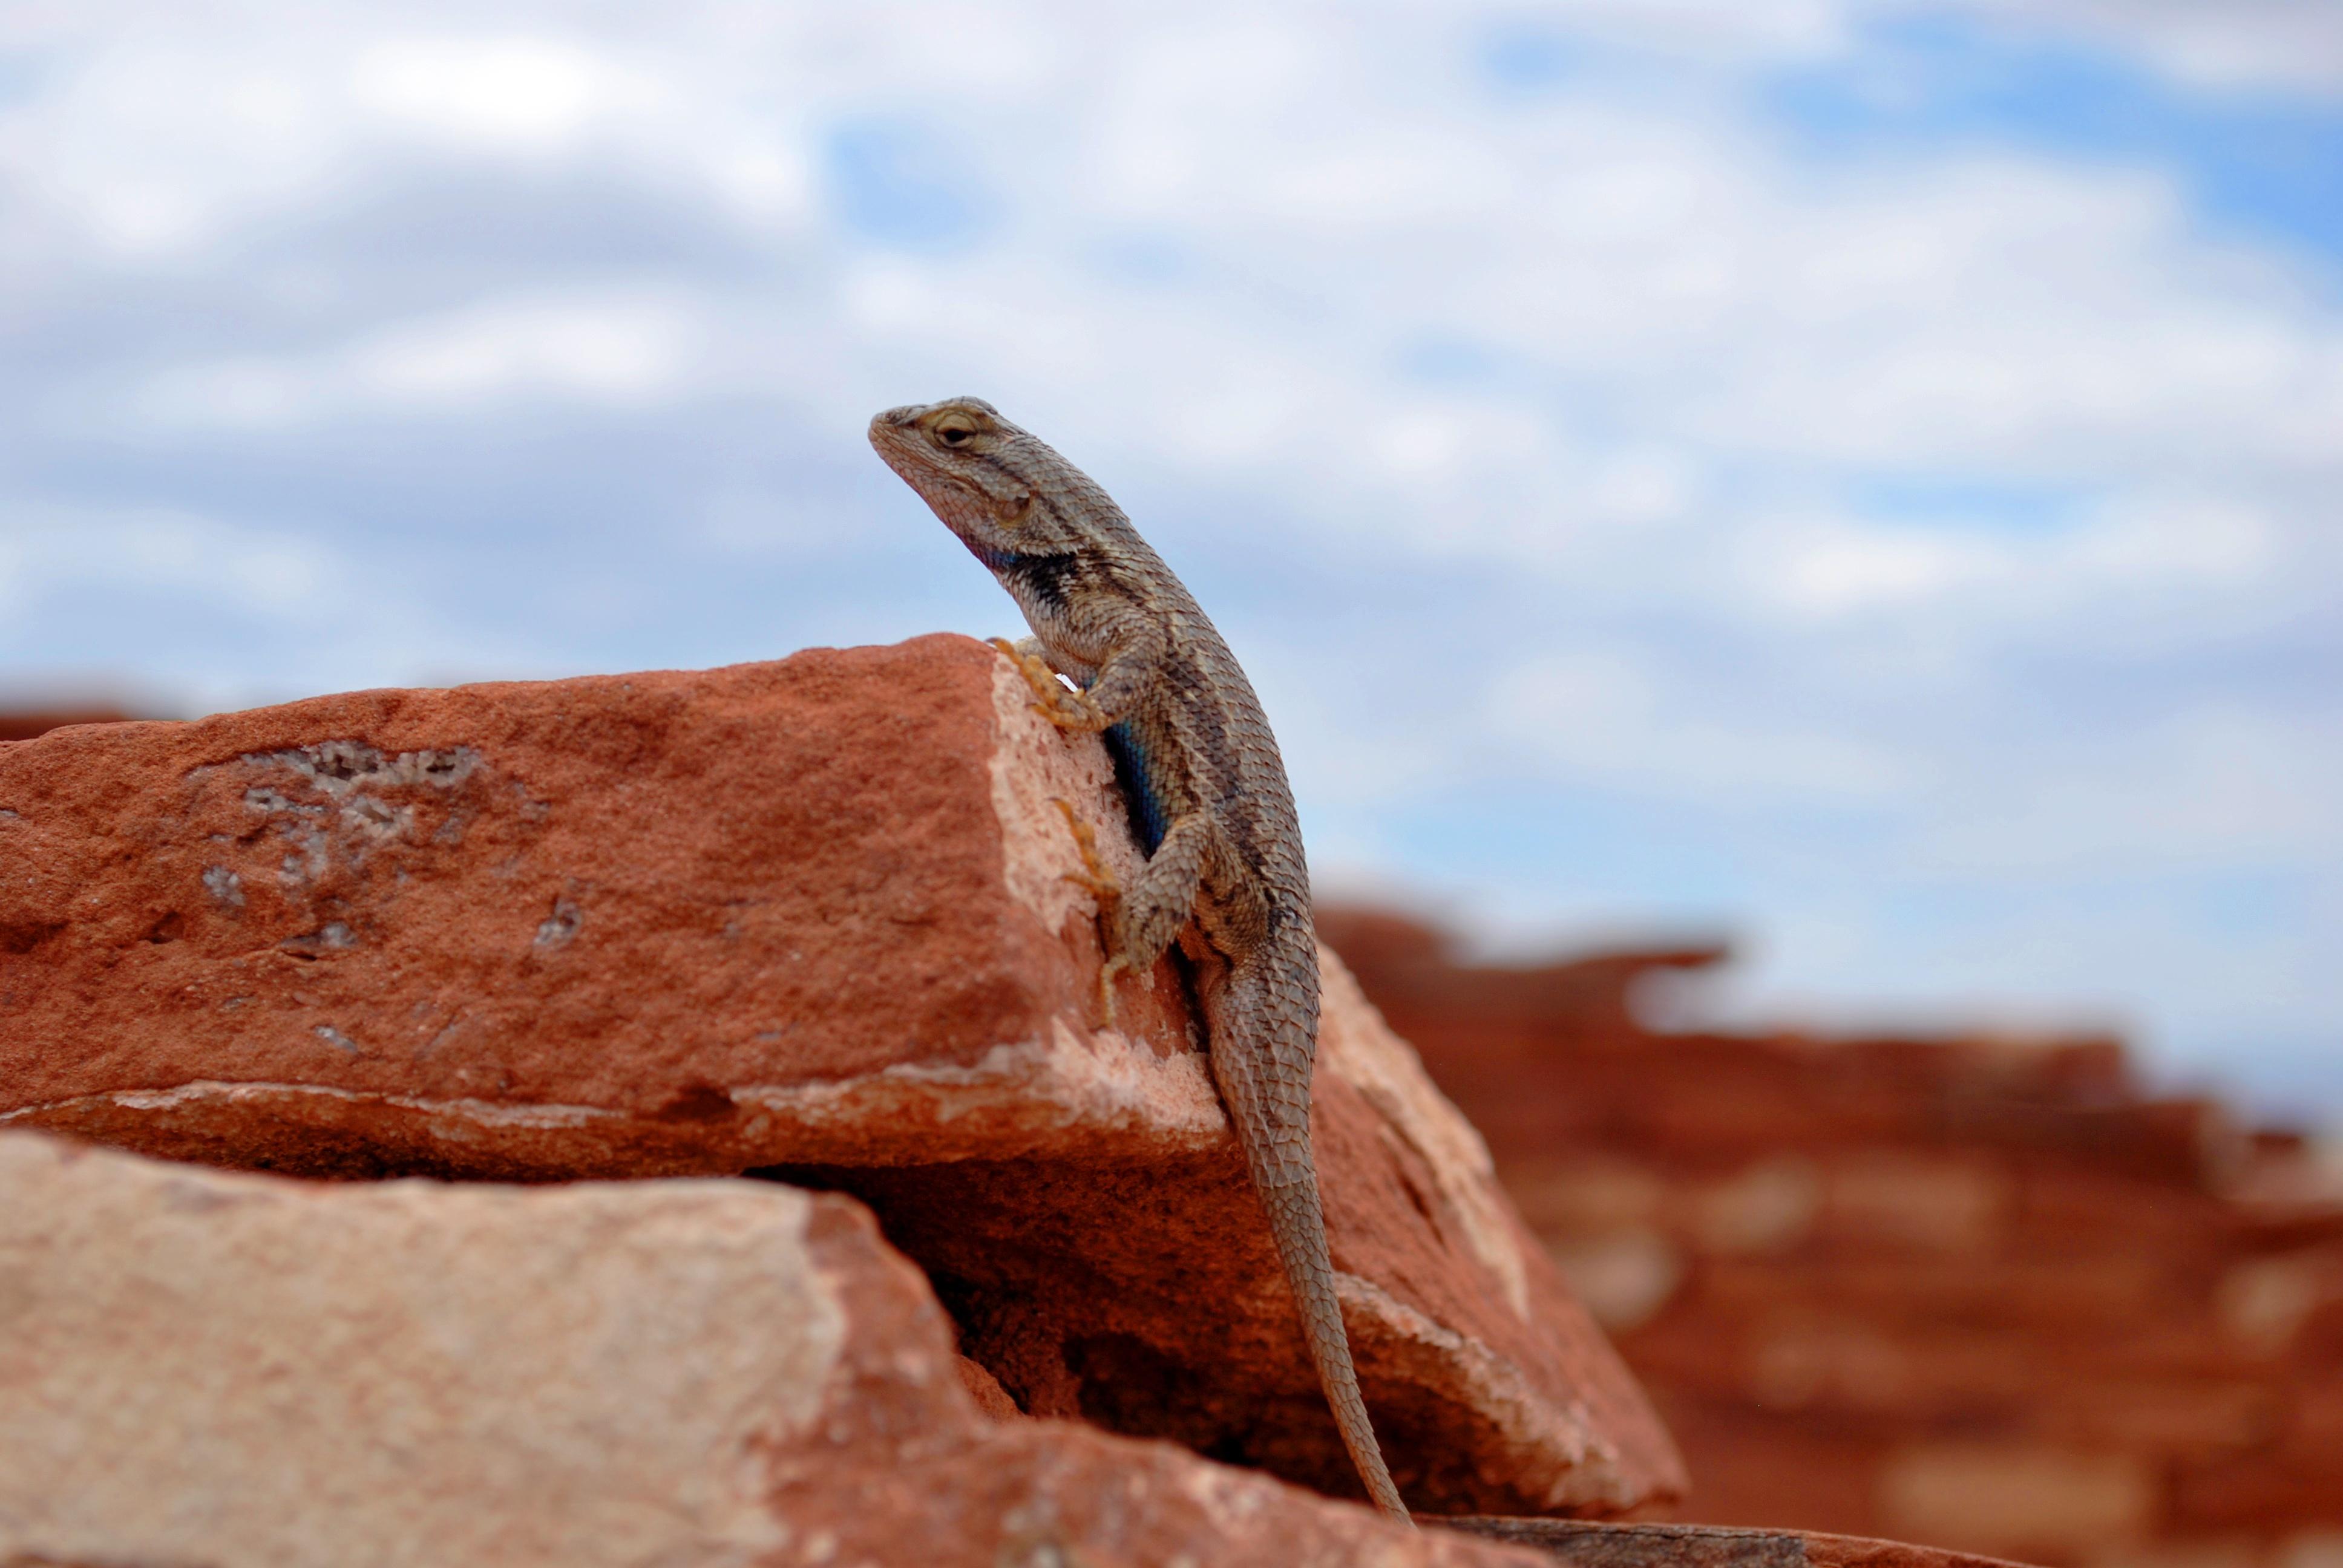 Lizard, Rocky, Stone, Tongue, Rock, HQ Photo